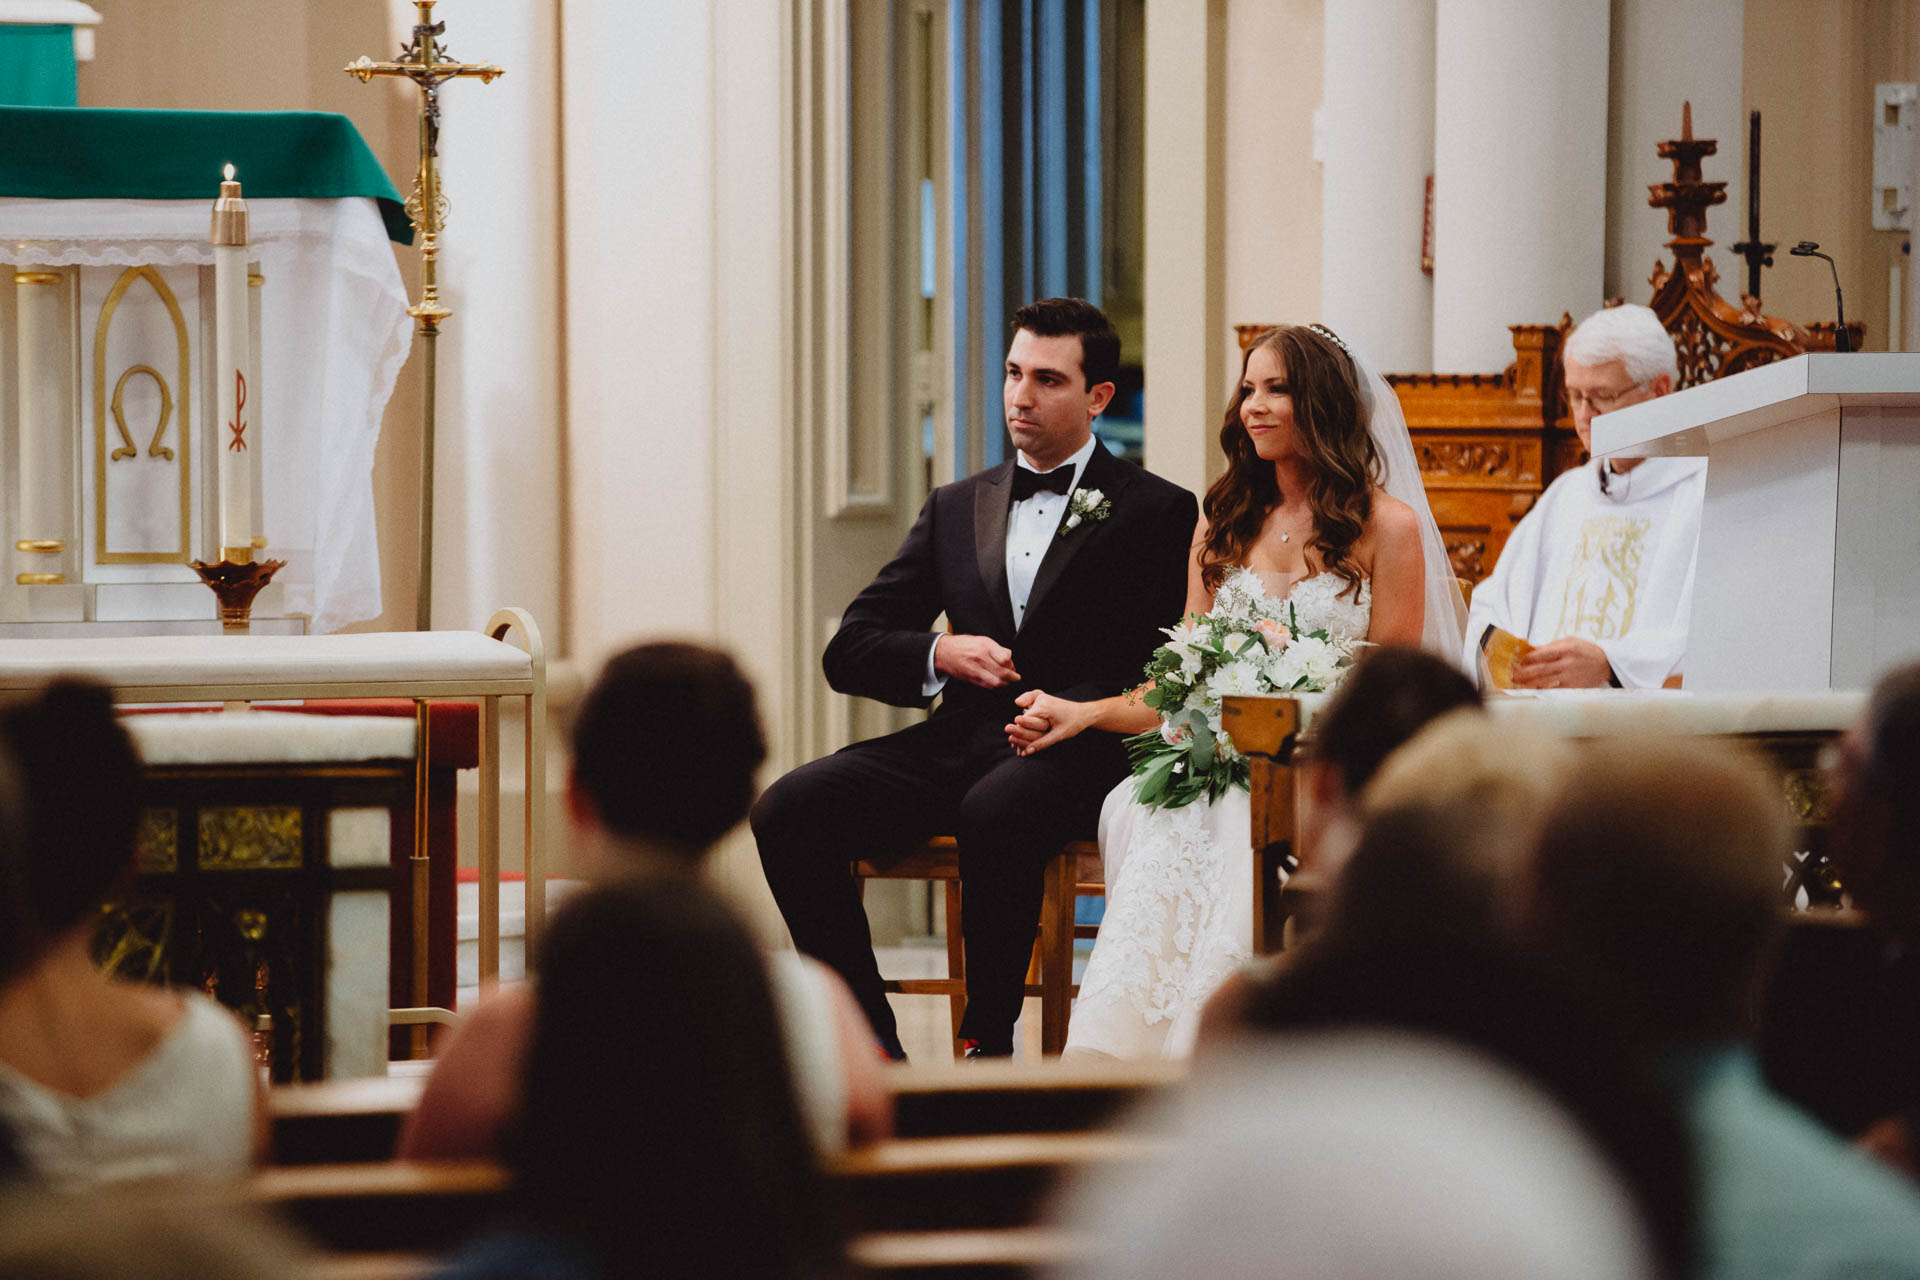 Keri-Joseph-Top-of-the-Market-Wedding-074@2x.jpg